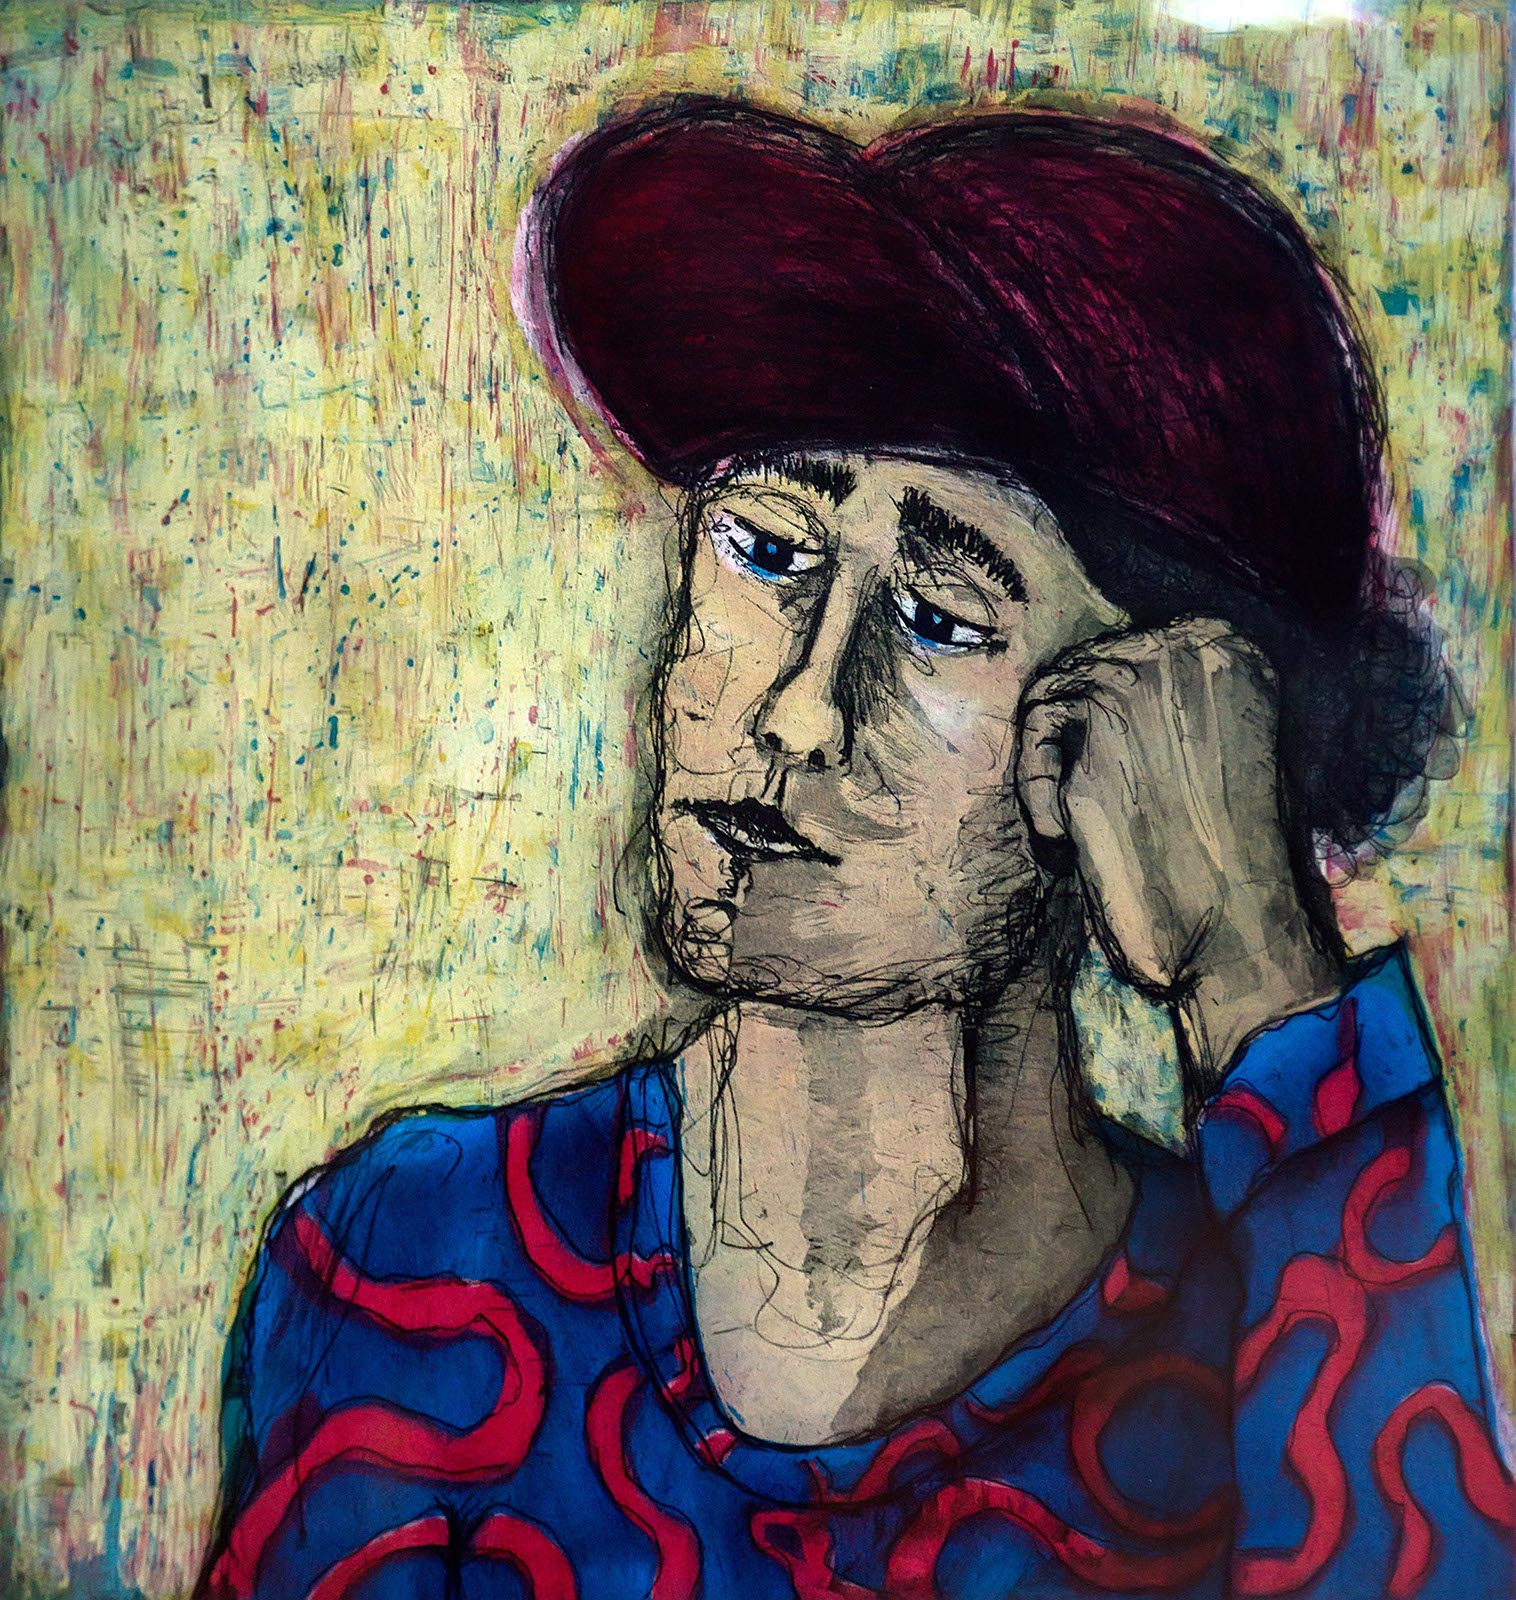 Фото №203563. BBYX II. Женщина в красной шляпе. 2013. Марти Макки, США, Сан-Франциско